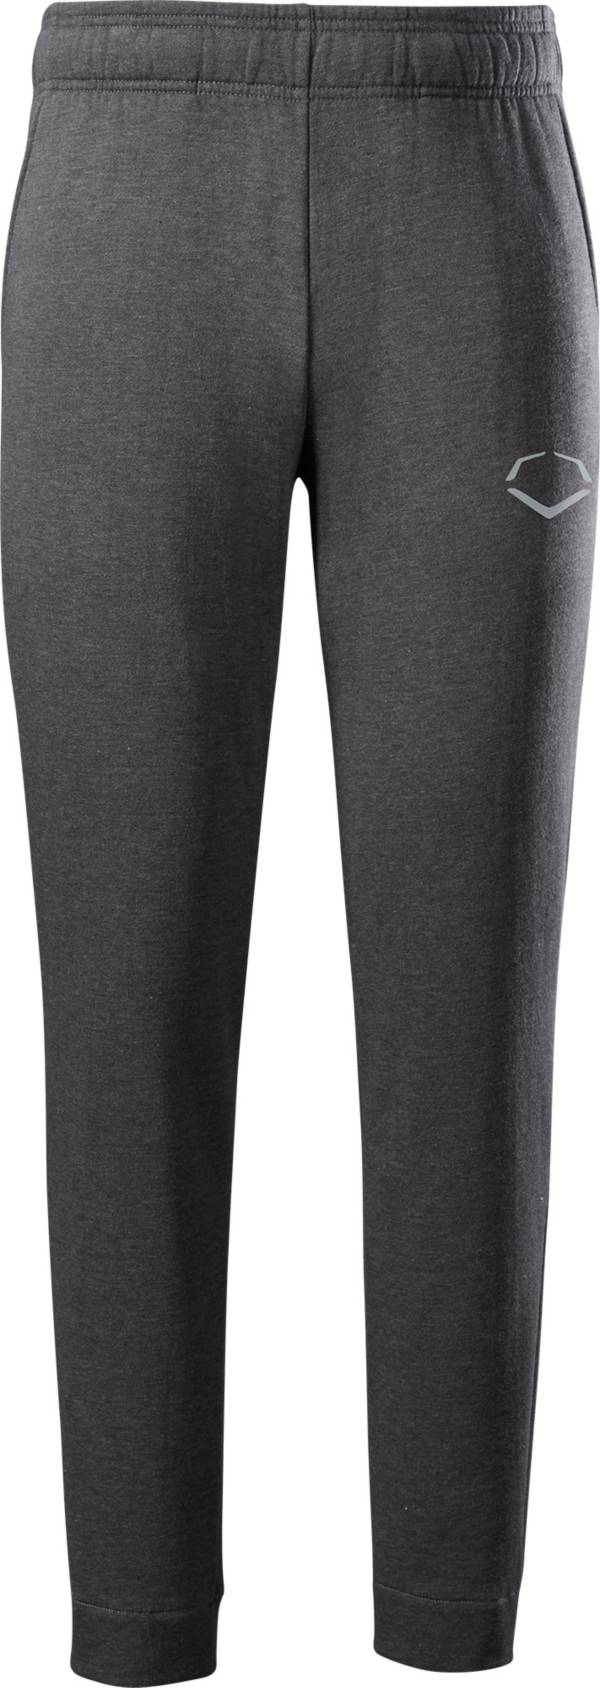 EvoShield Boys' Pro Team Fleece Pants product image